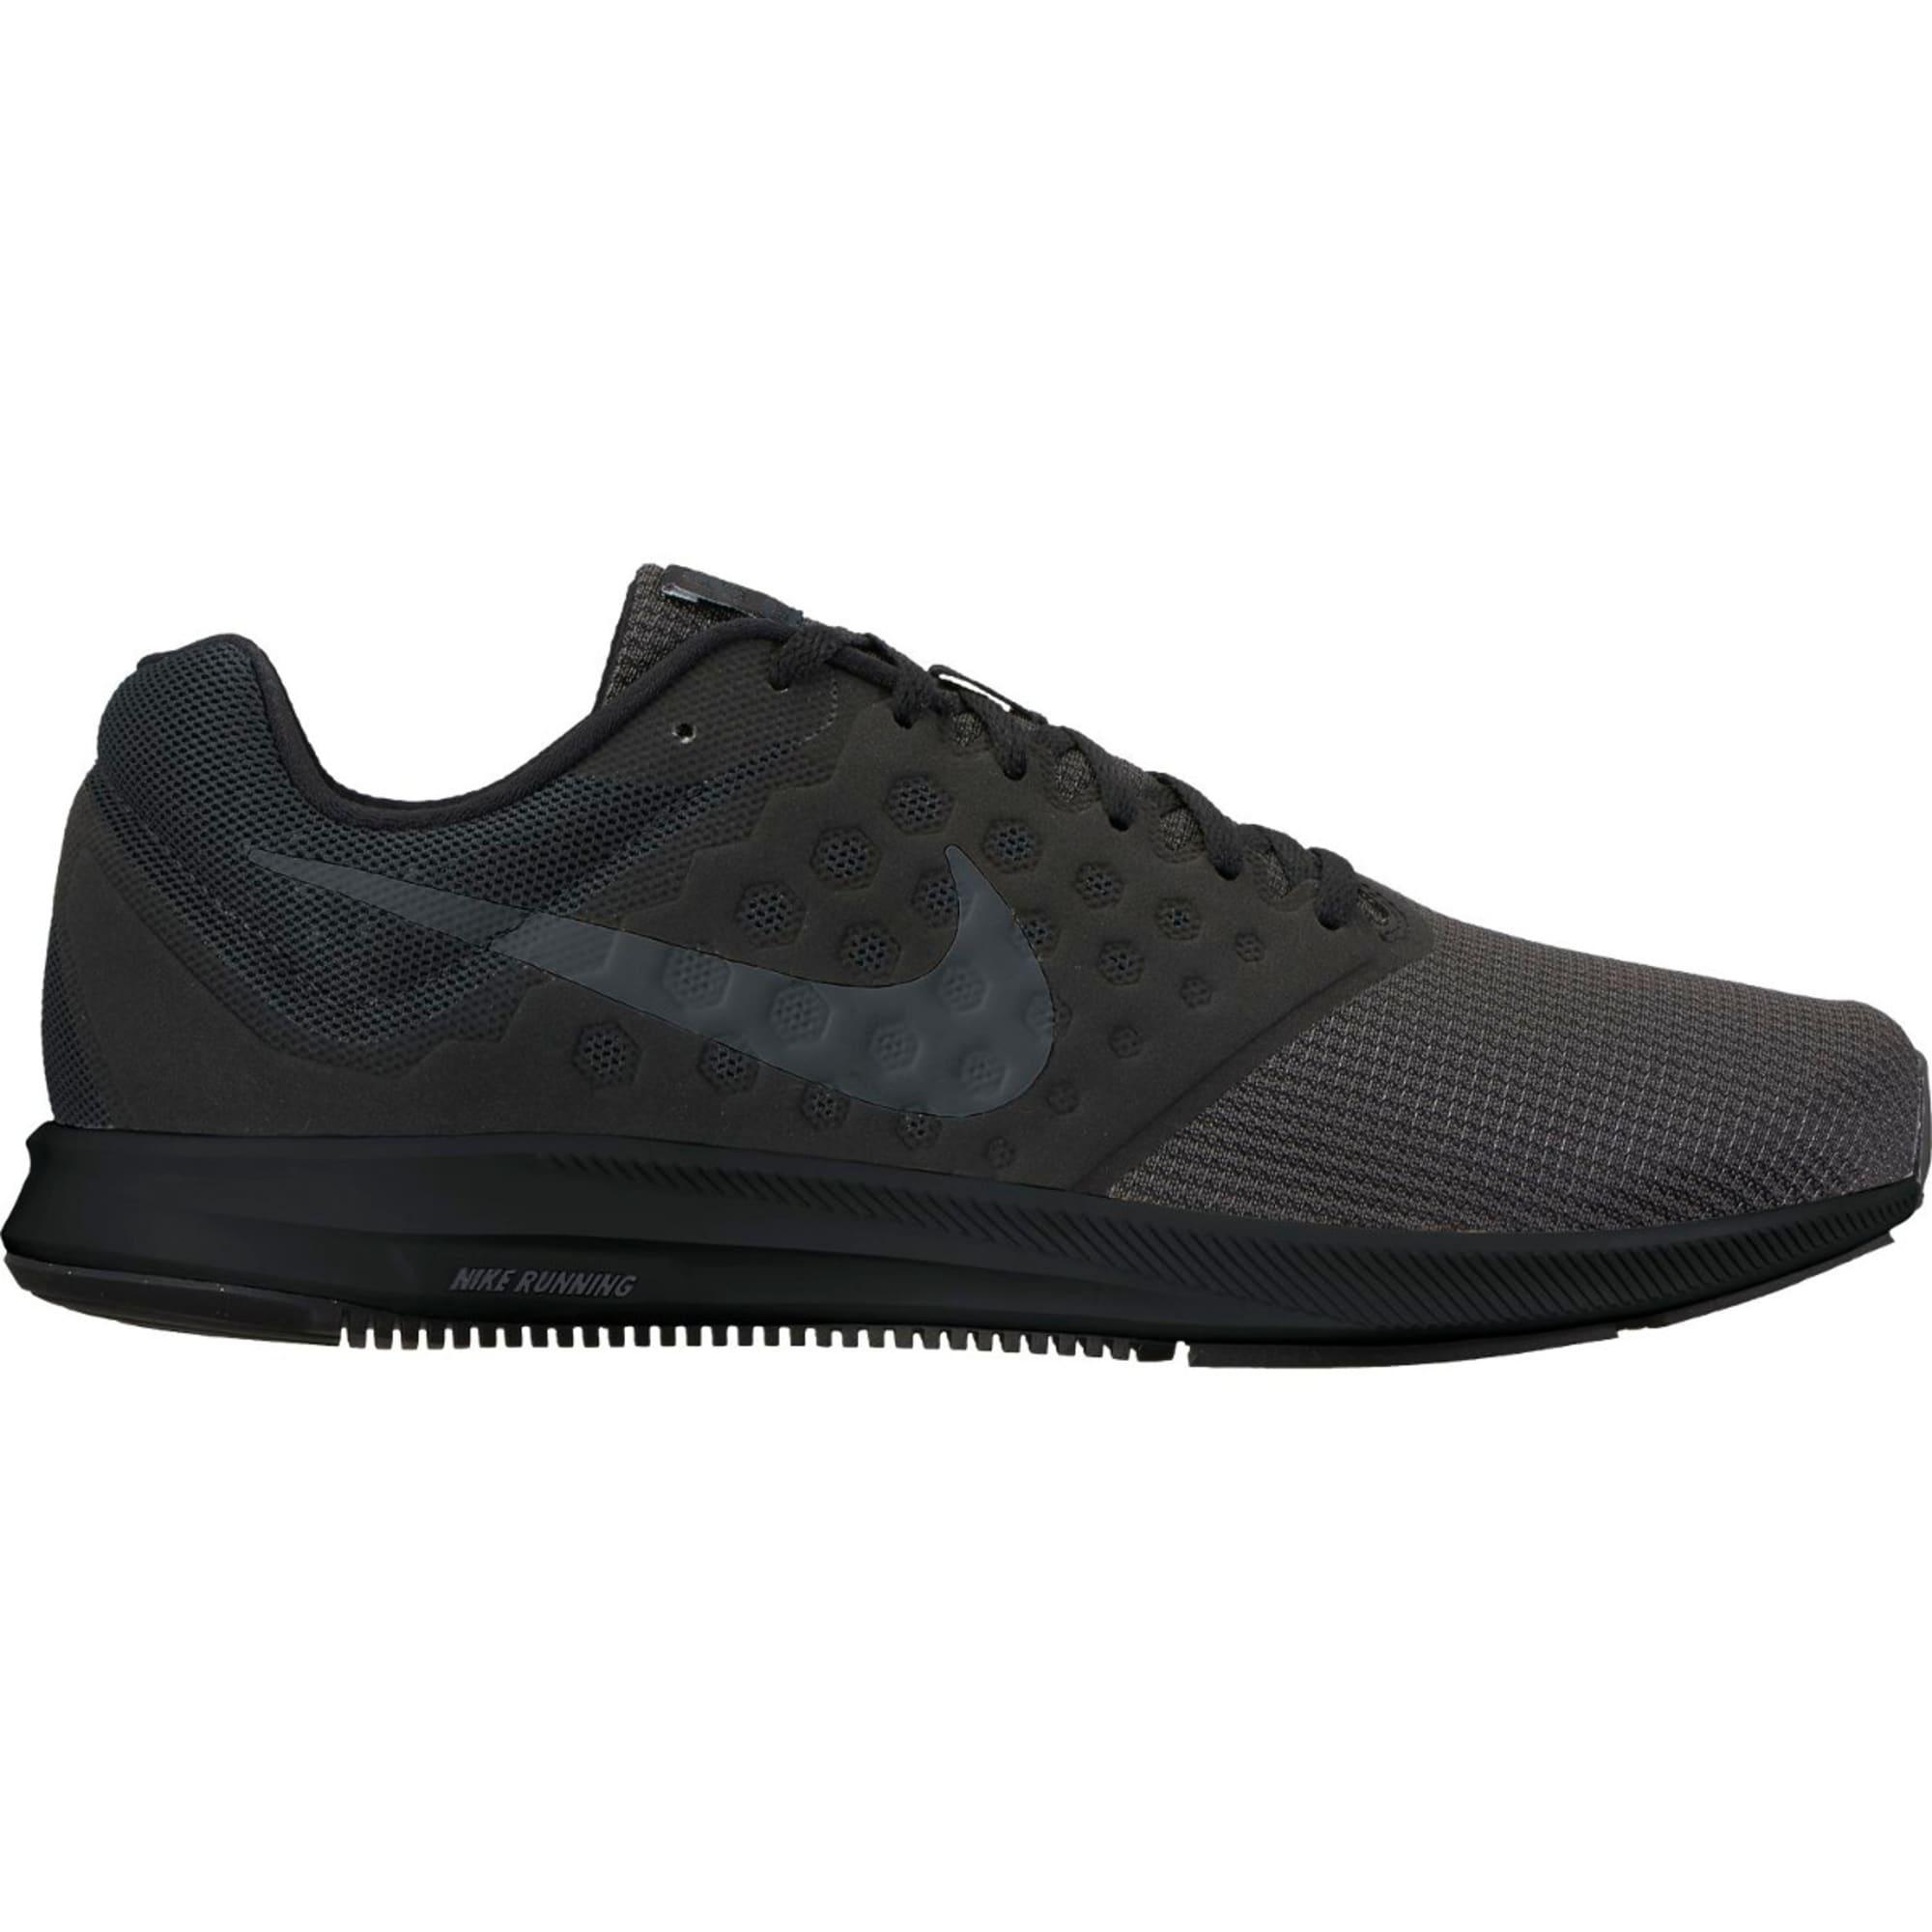 Problema embrague Adelantar  NIKE Men's Downshifter 7 Running Shoes, Wide - Bob's Stores